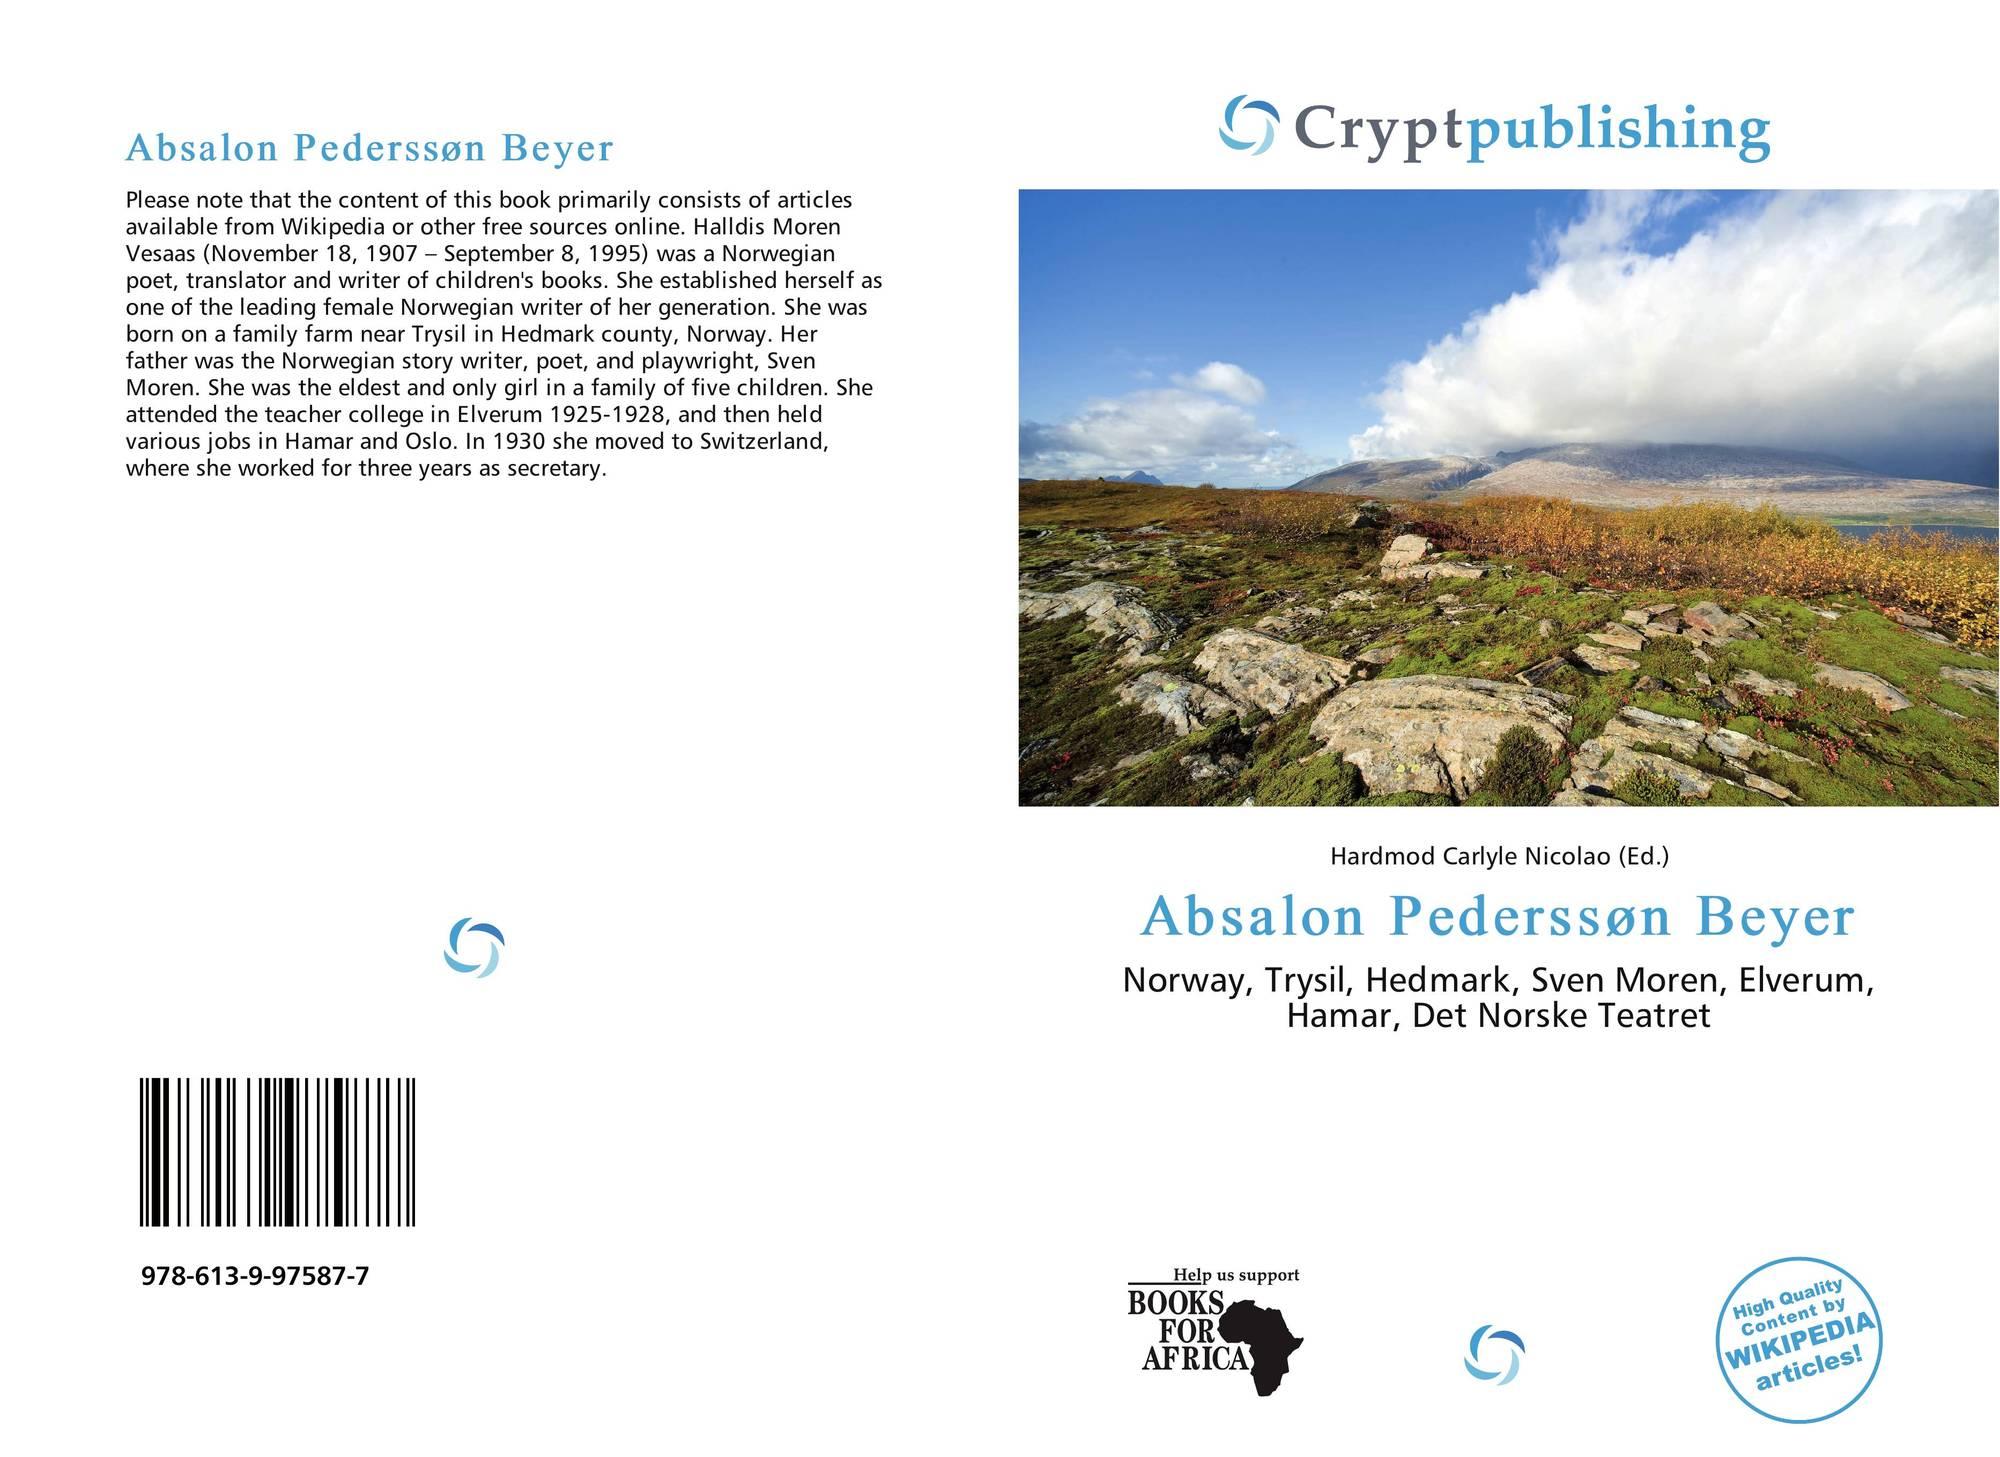 Absalon Pederssøn Beyer, 978-613-9-97587-7, 6139975875 ,9786139975877